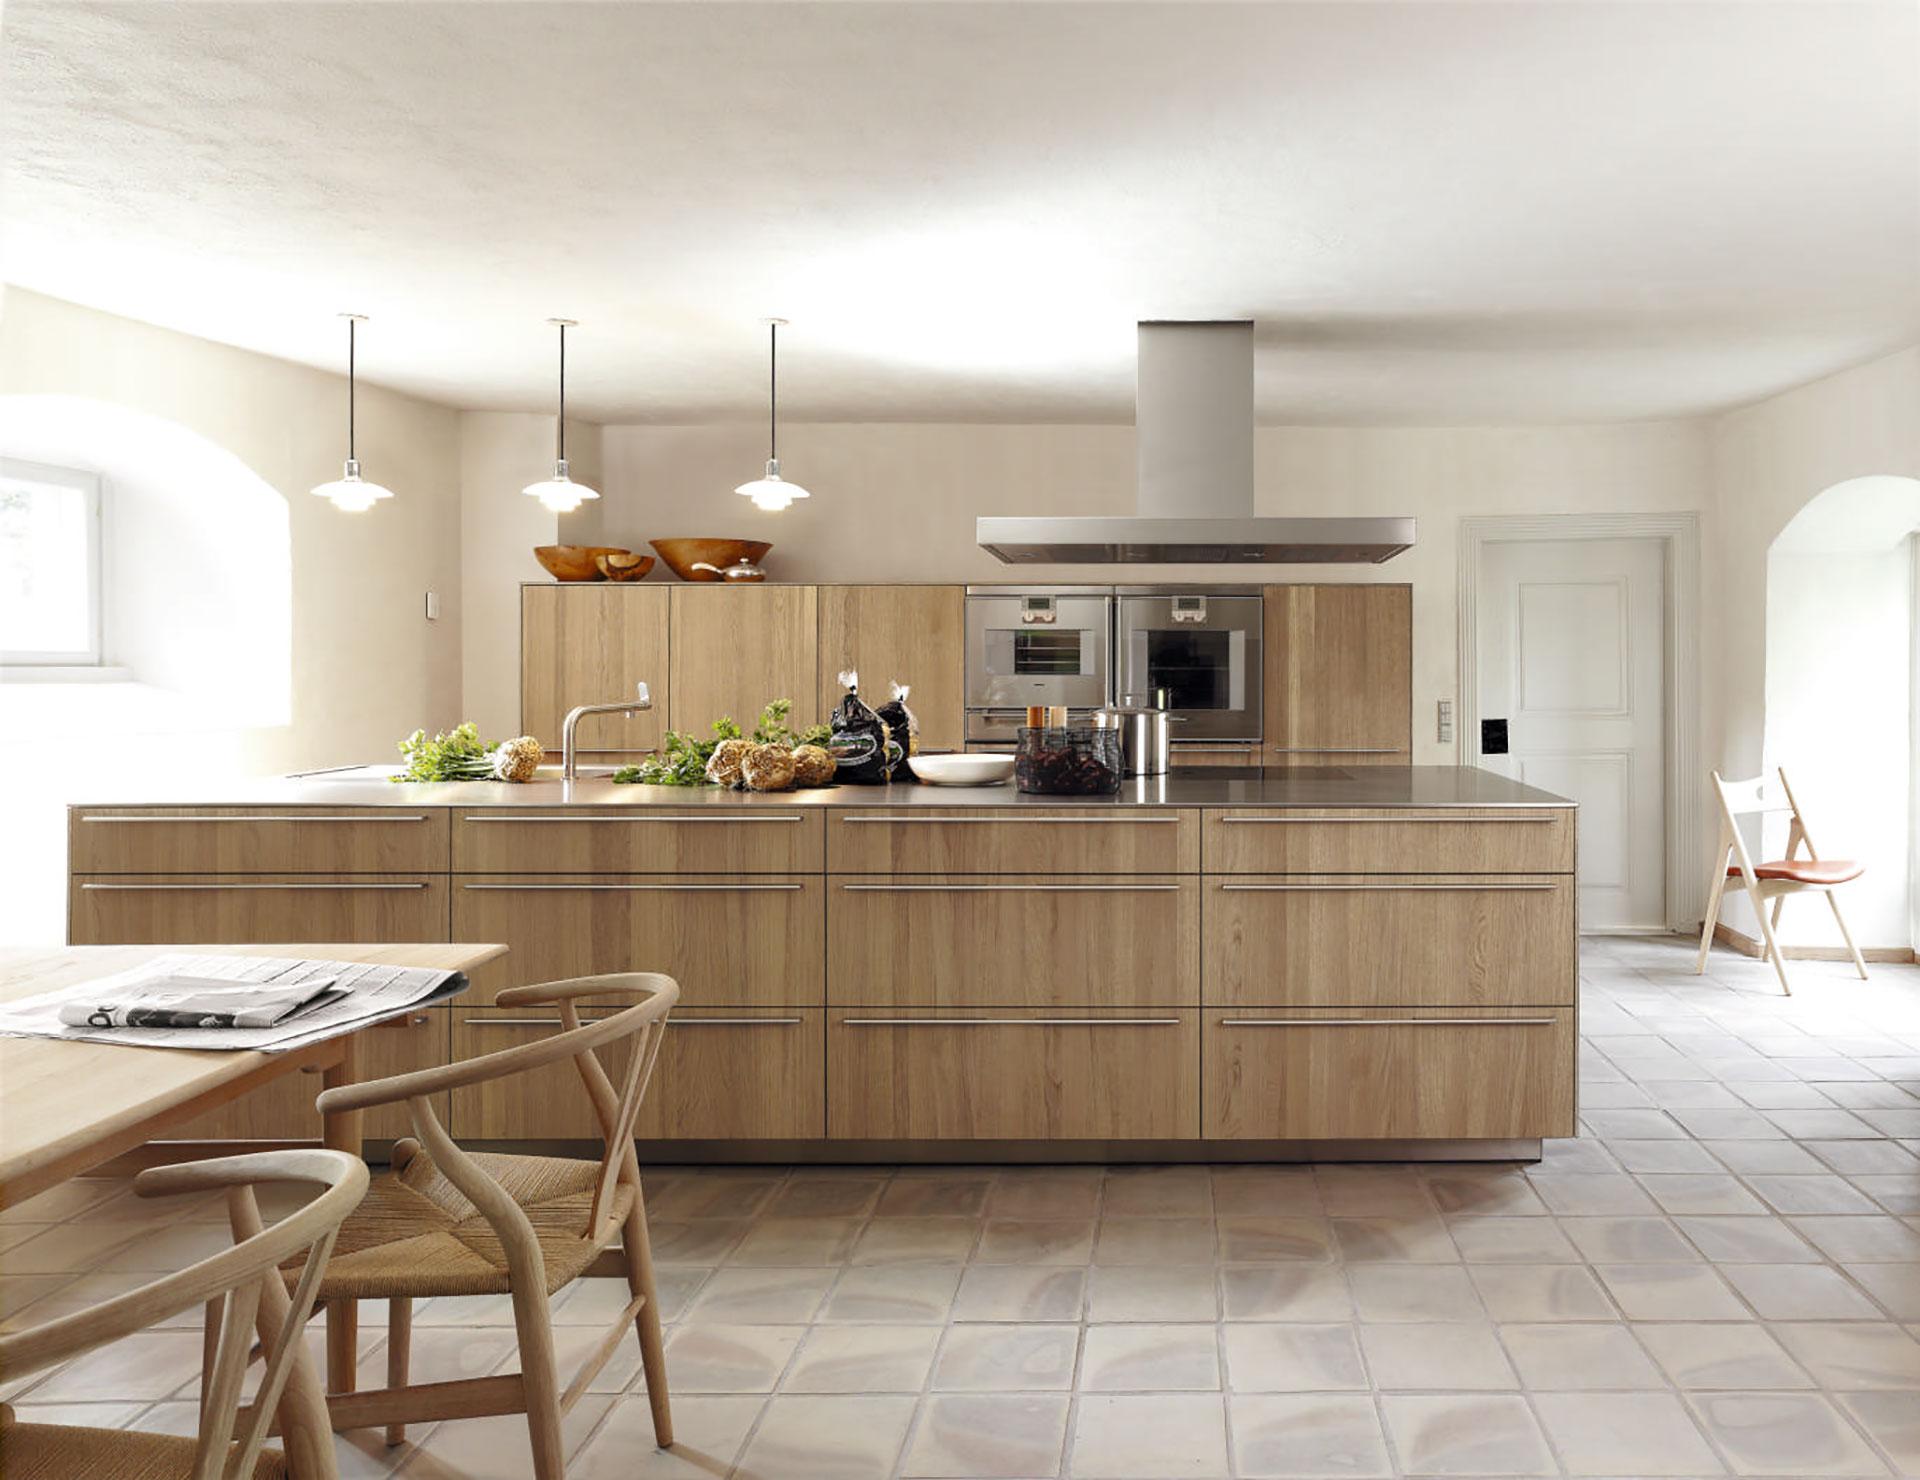 bulthaup scottsdale authorized bulthaup partner. Black Bedroom Furniture Sets. Home Design Ideas